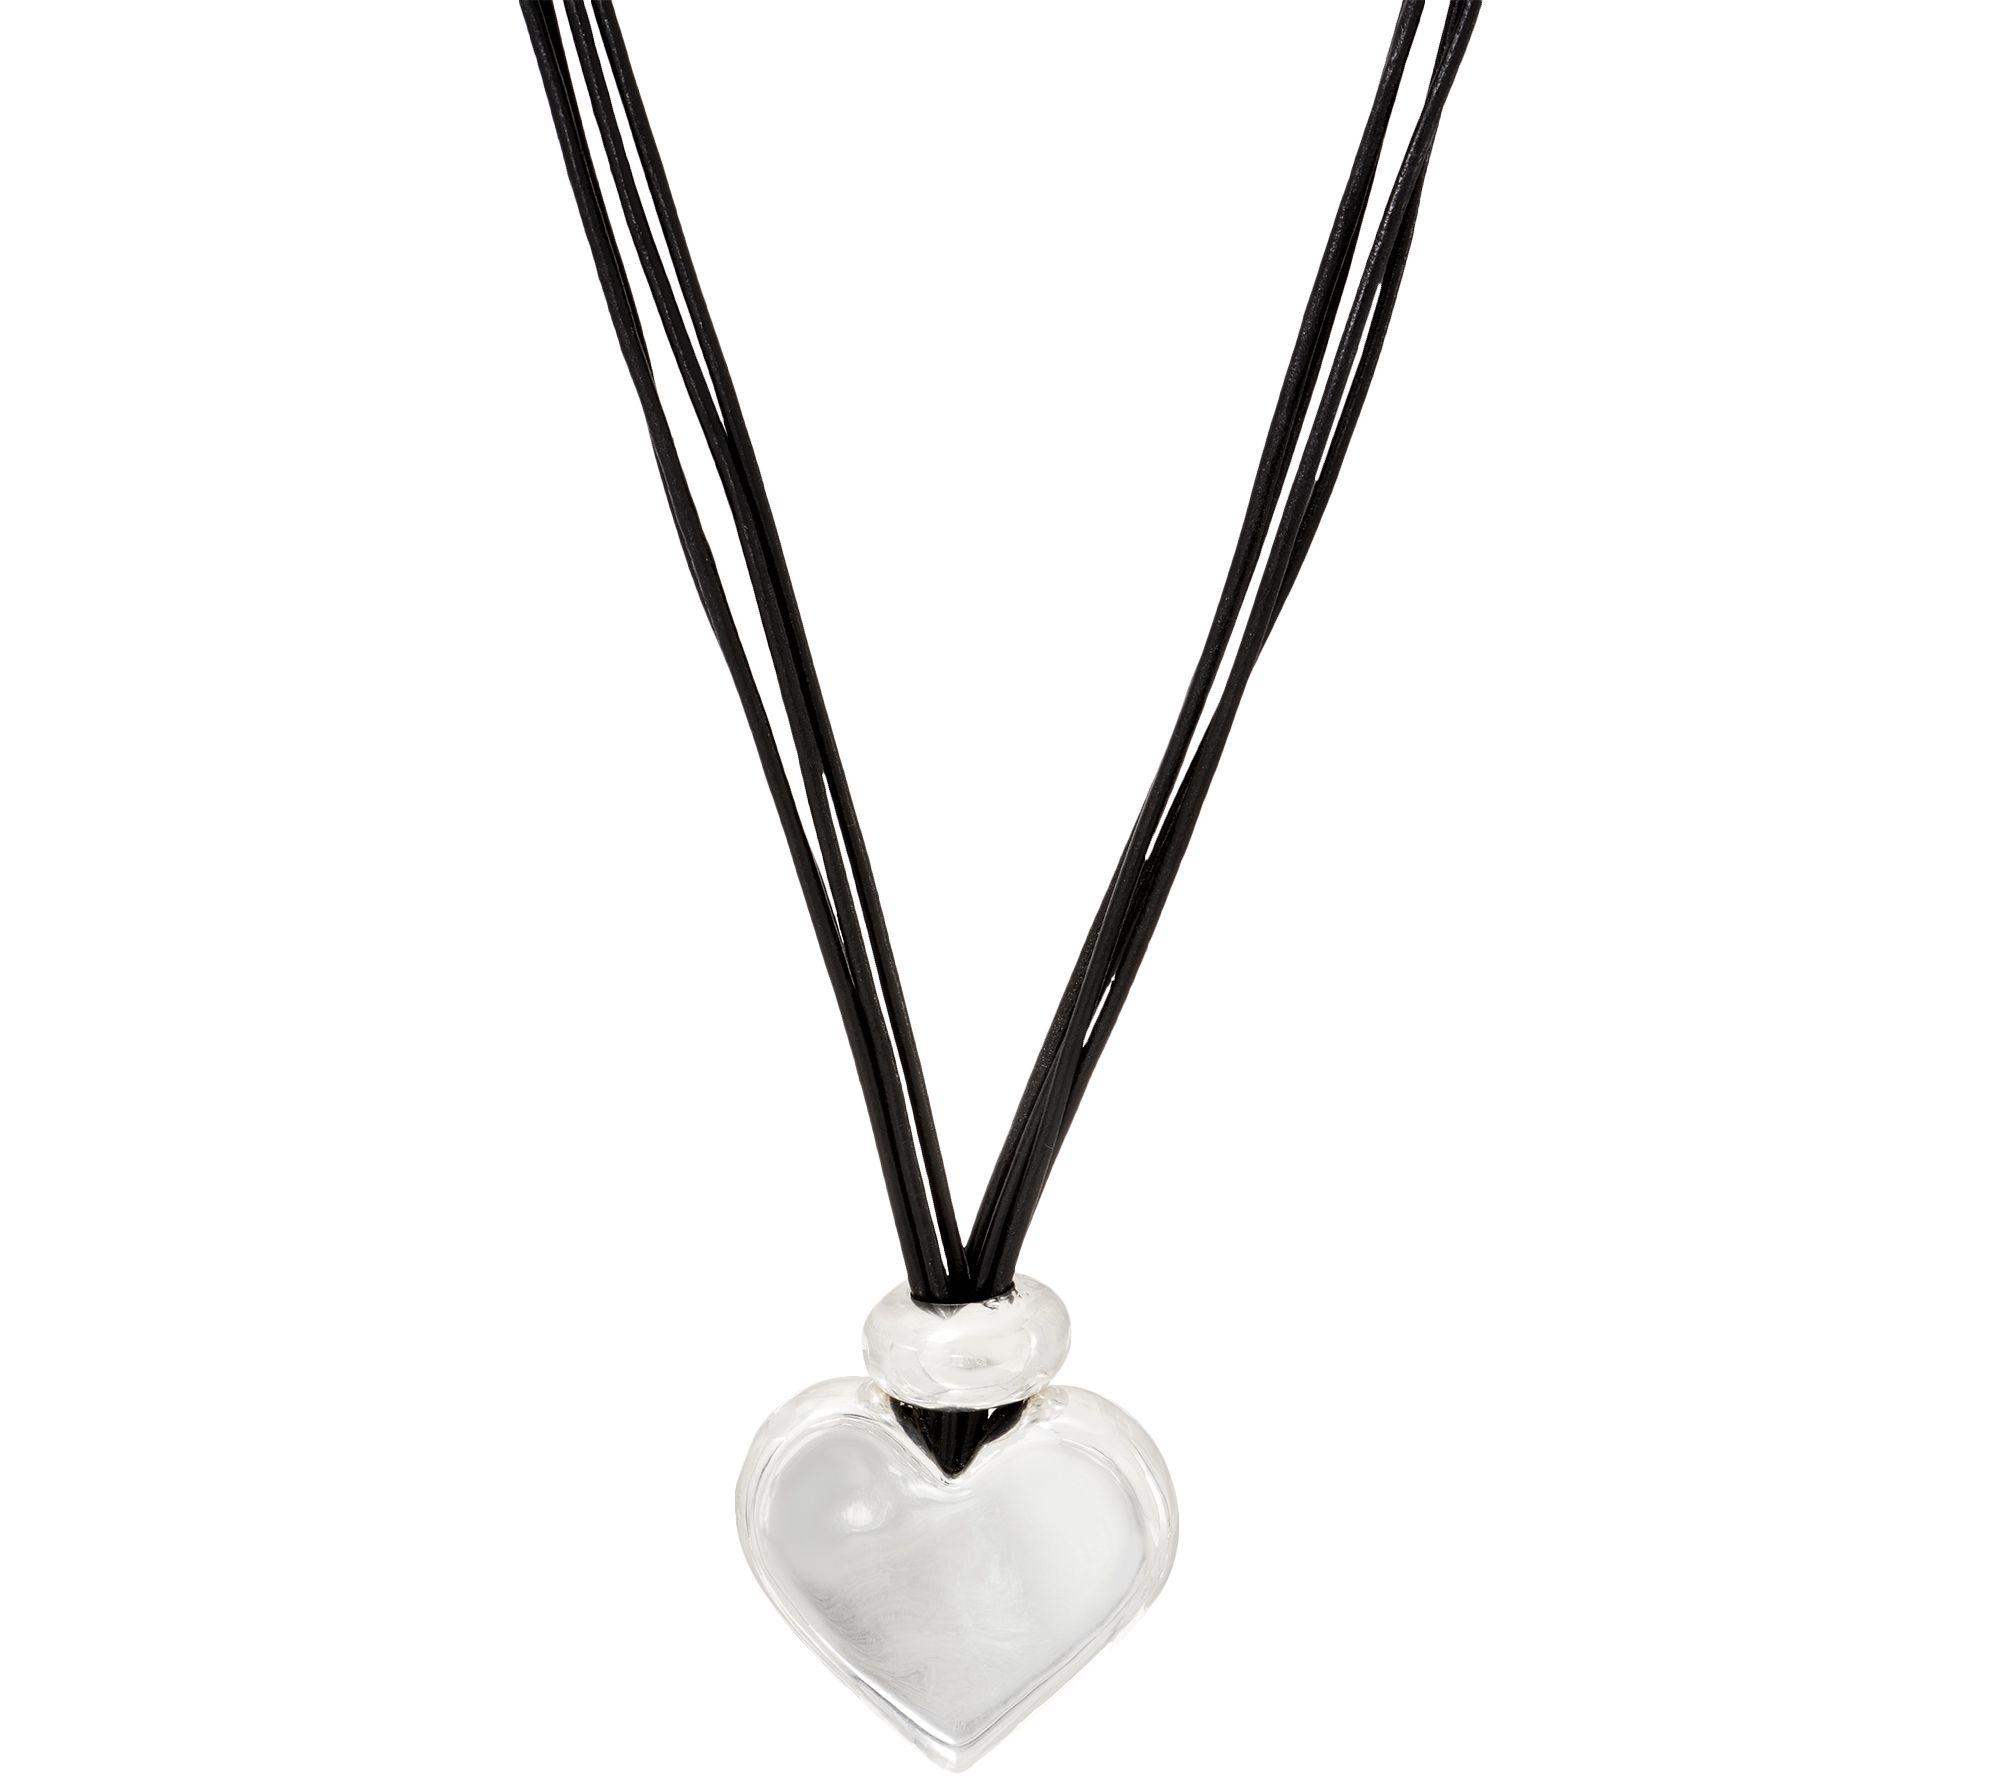 d78218d4e7f Simon Sebbag Sterling Silver   Leather Cord Pendant Necklace - Page 1 —  QVC.com